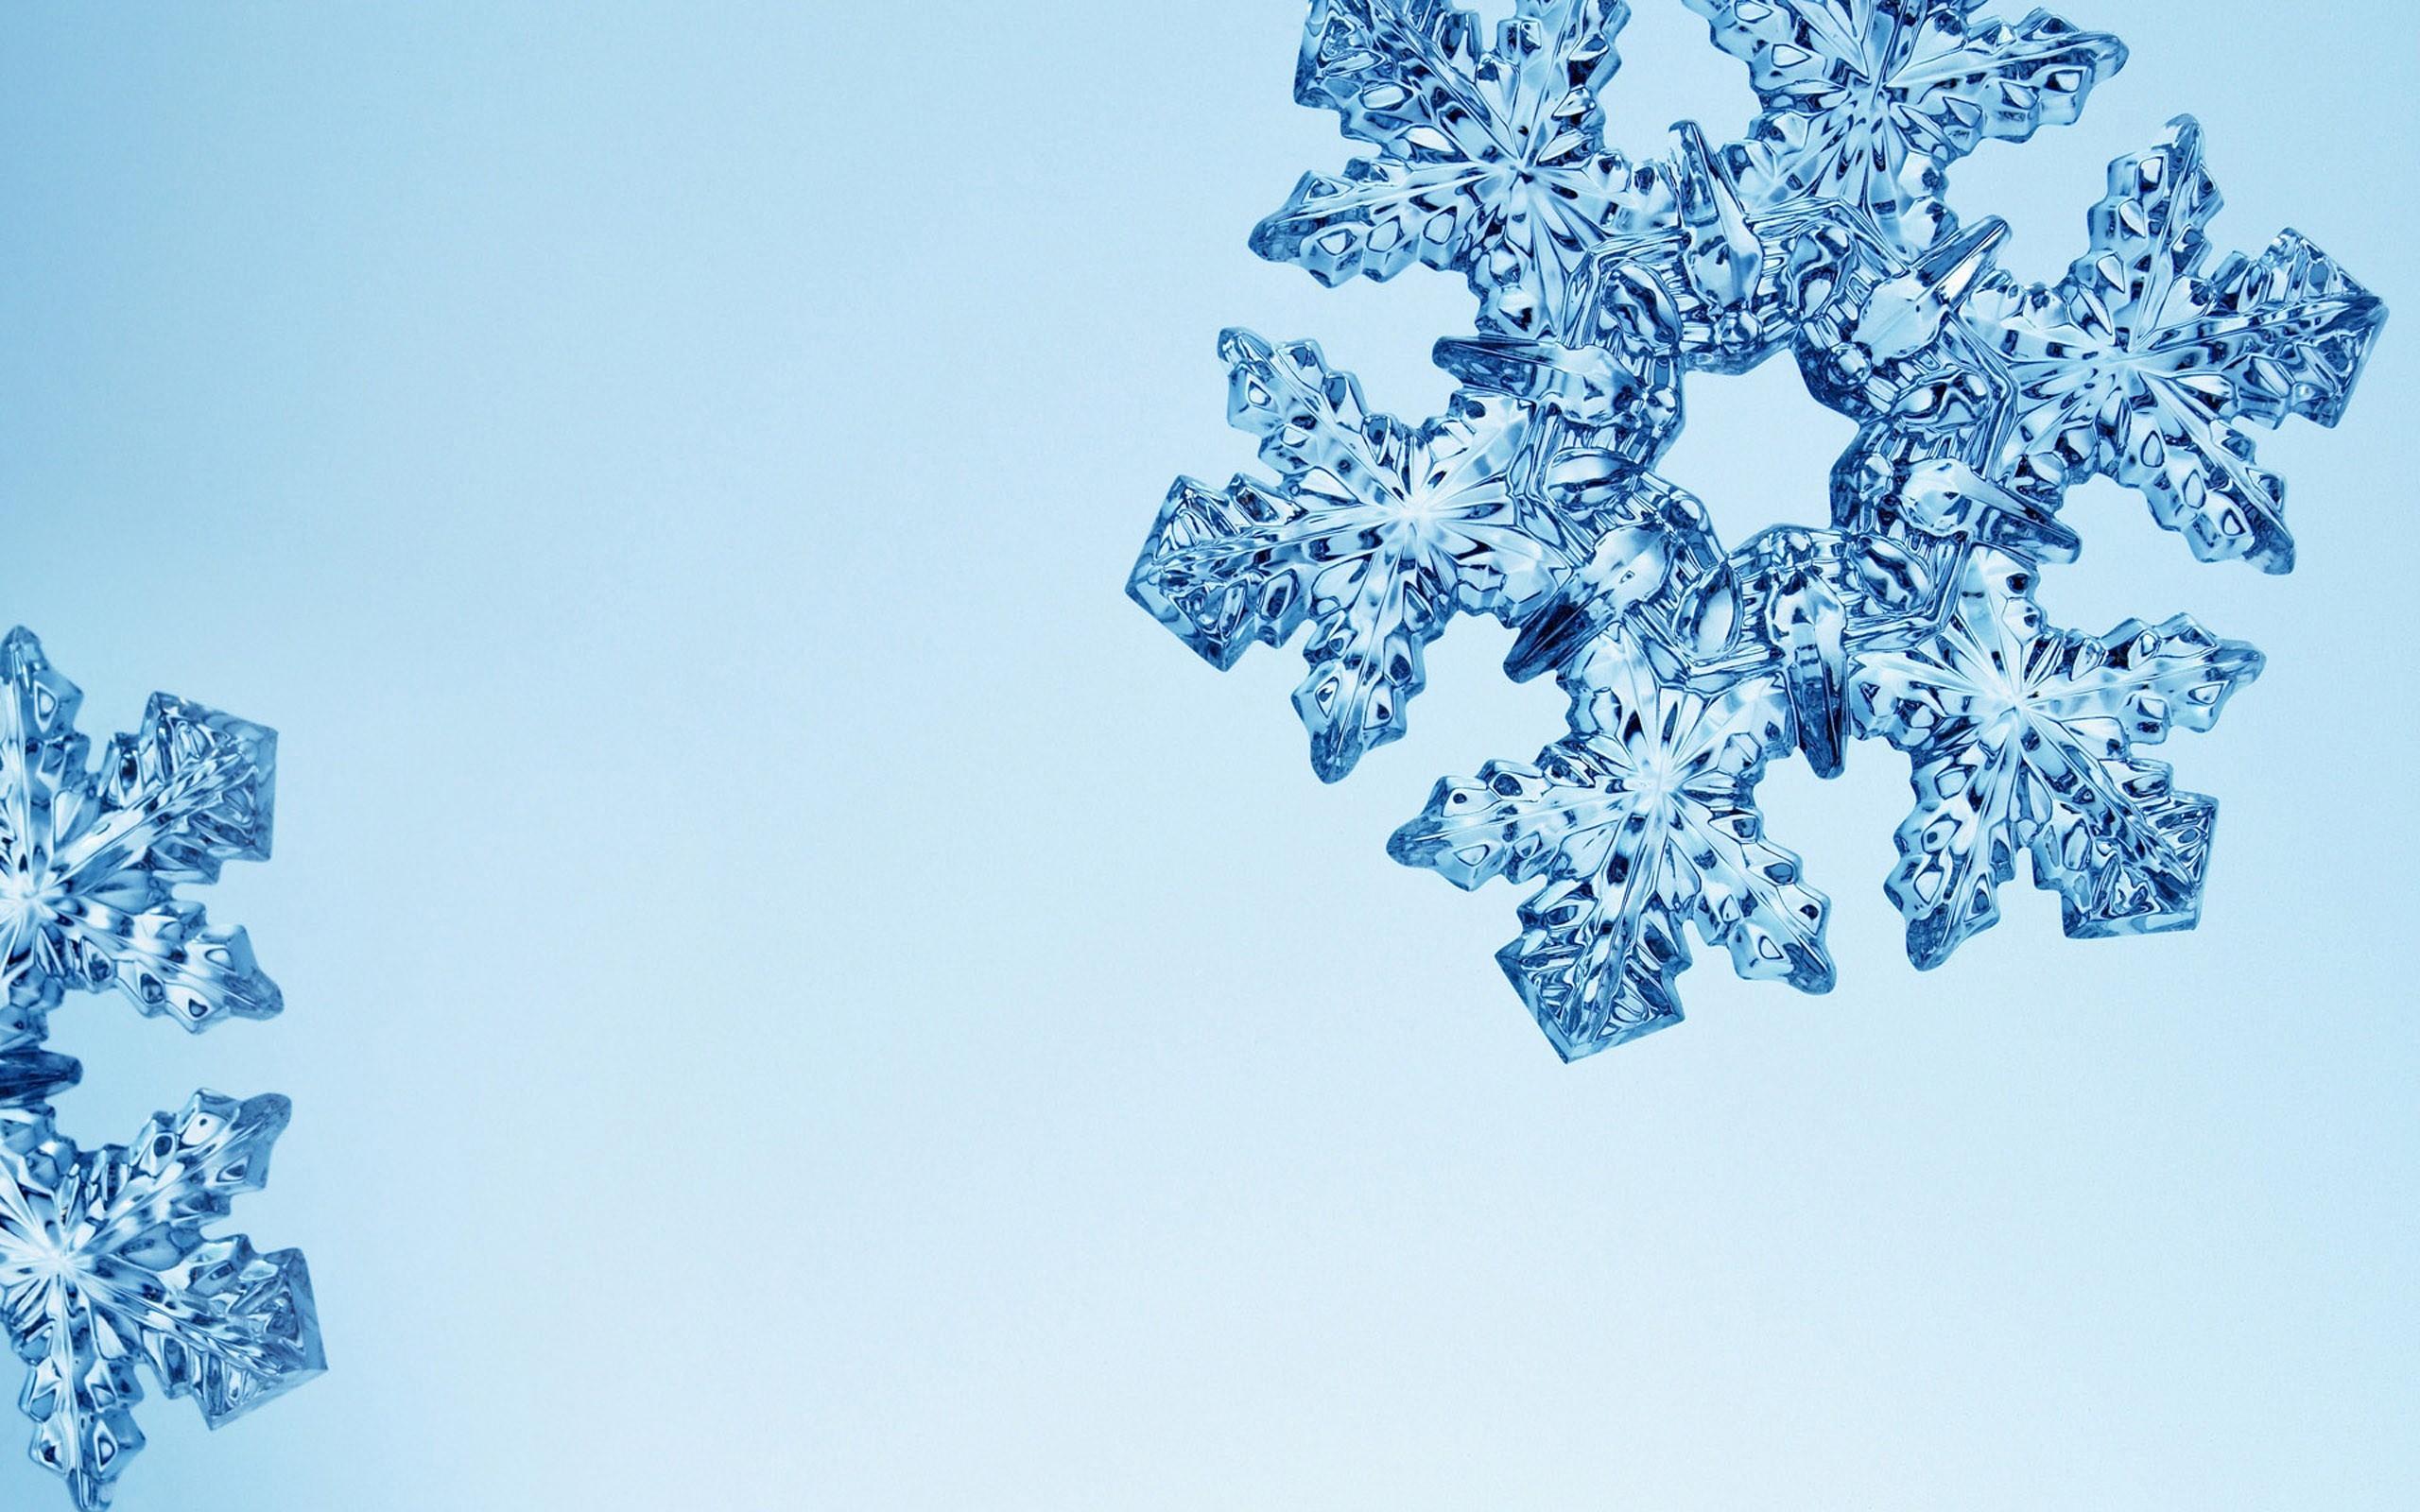 Computer Pink Snowflake Wallpapers, Desktop Backgrounds 1920×1080 Id